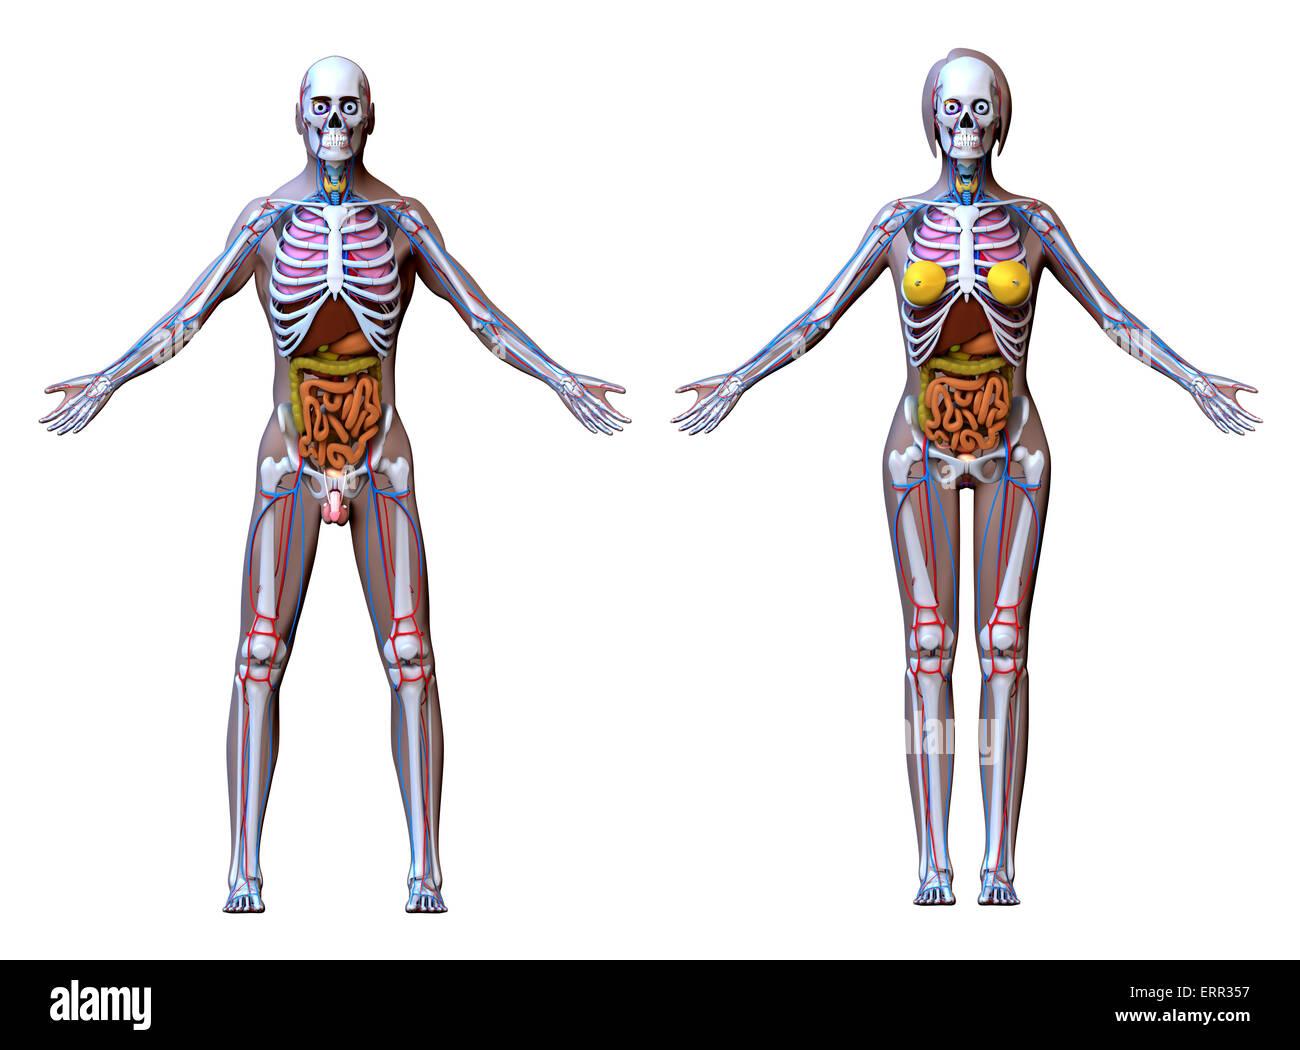 Muskulatur Stockfotos & Muskulatur Bilder - Alamy